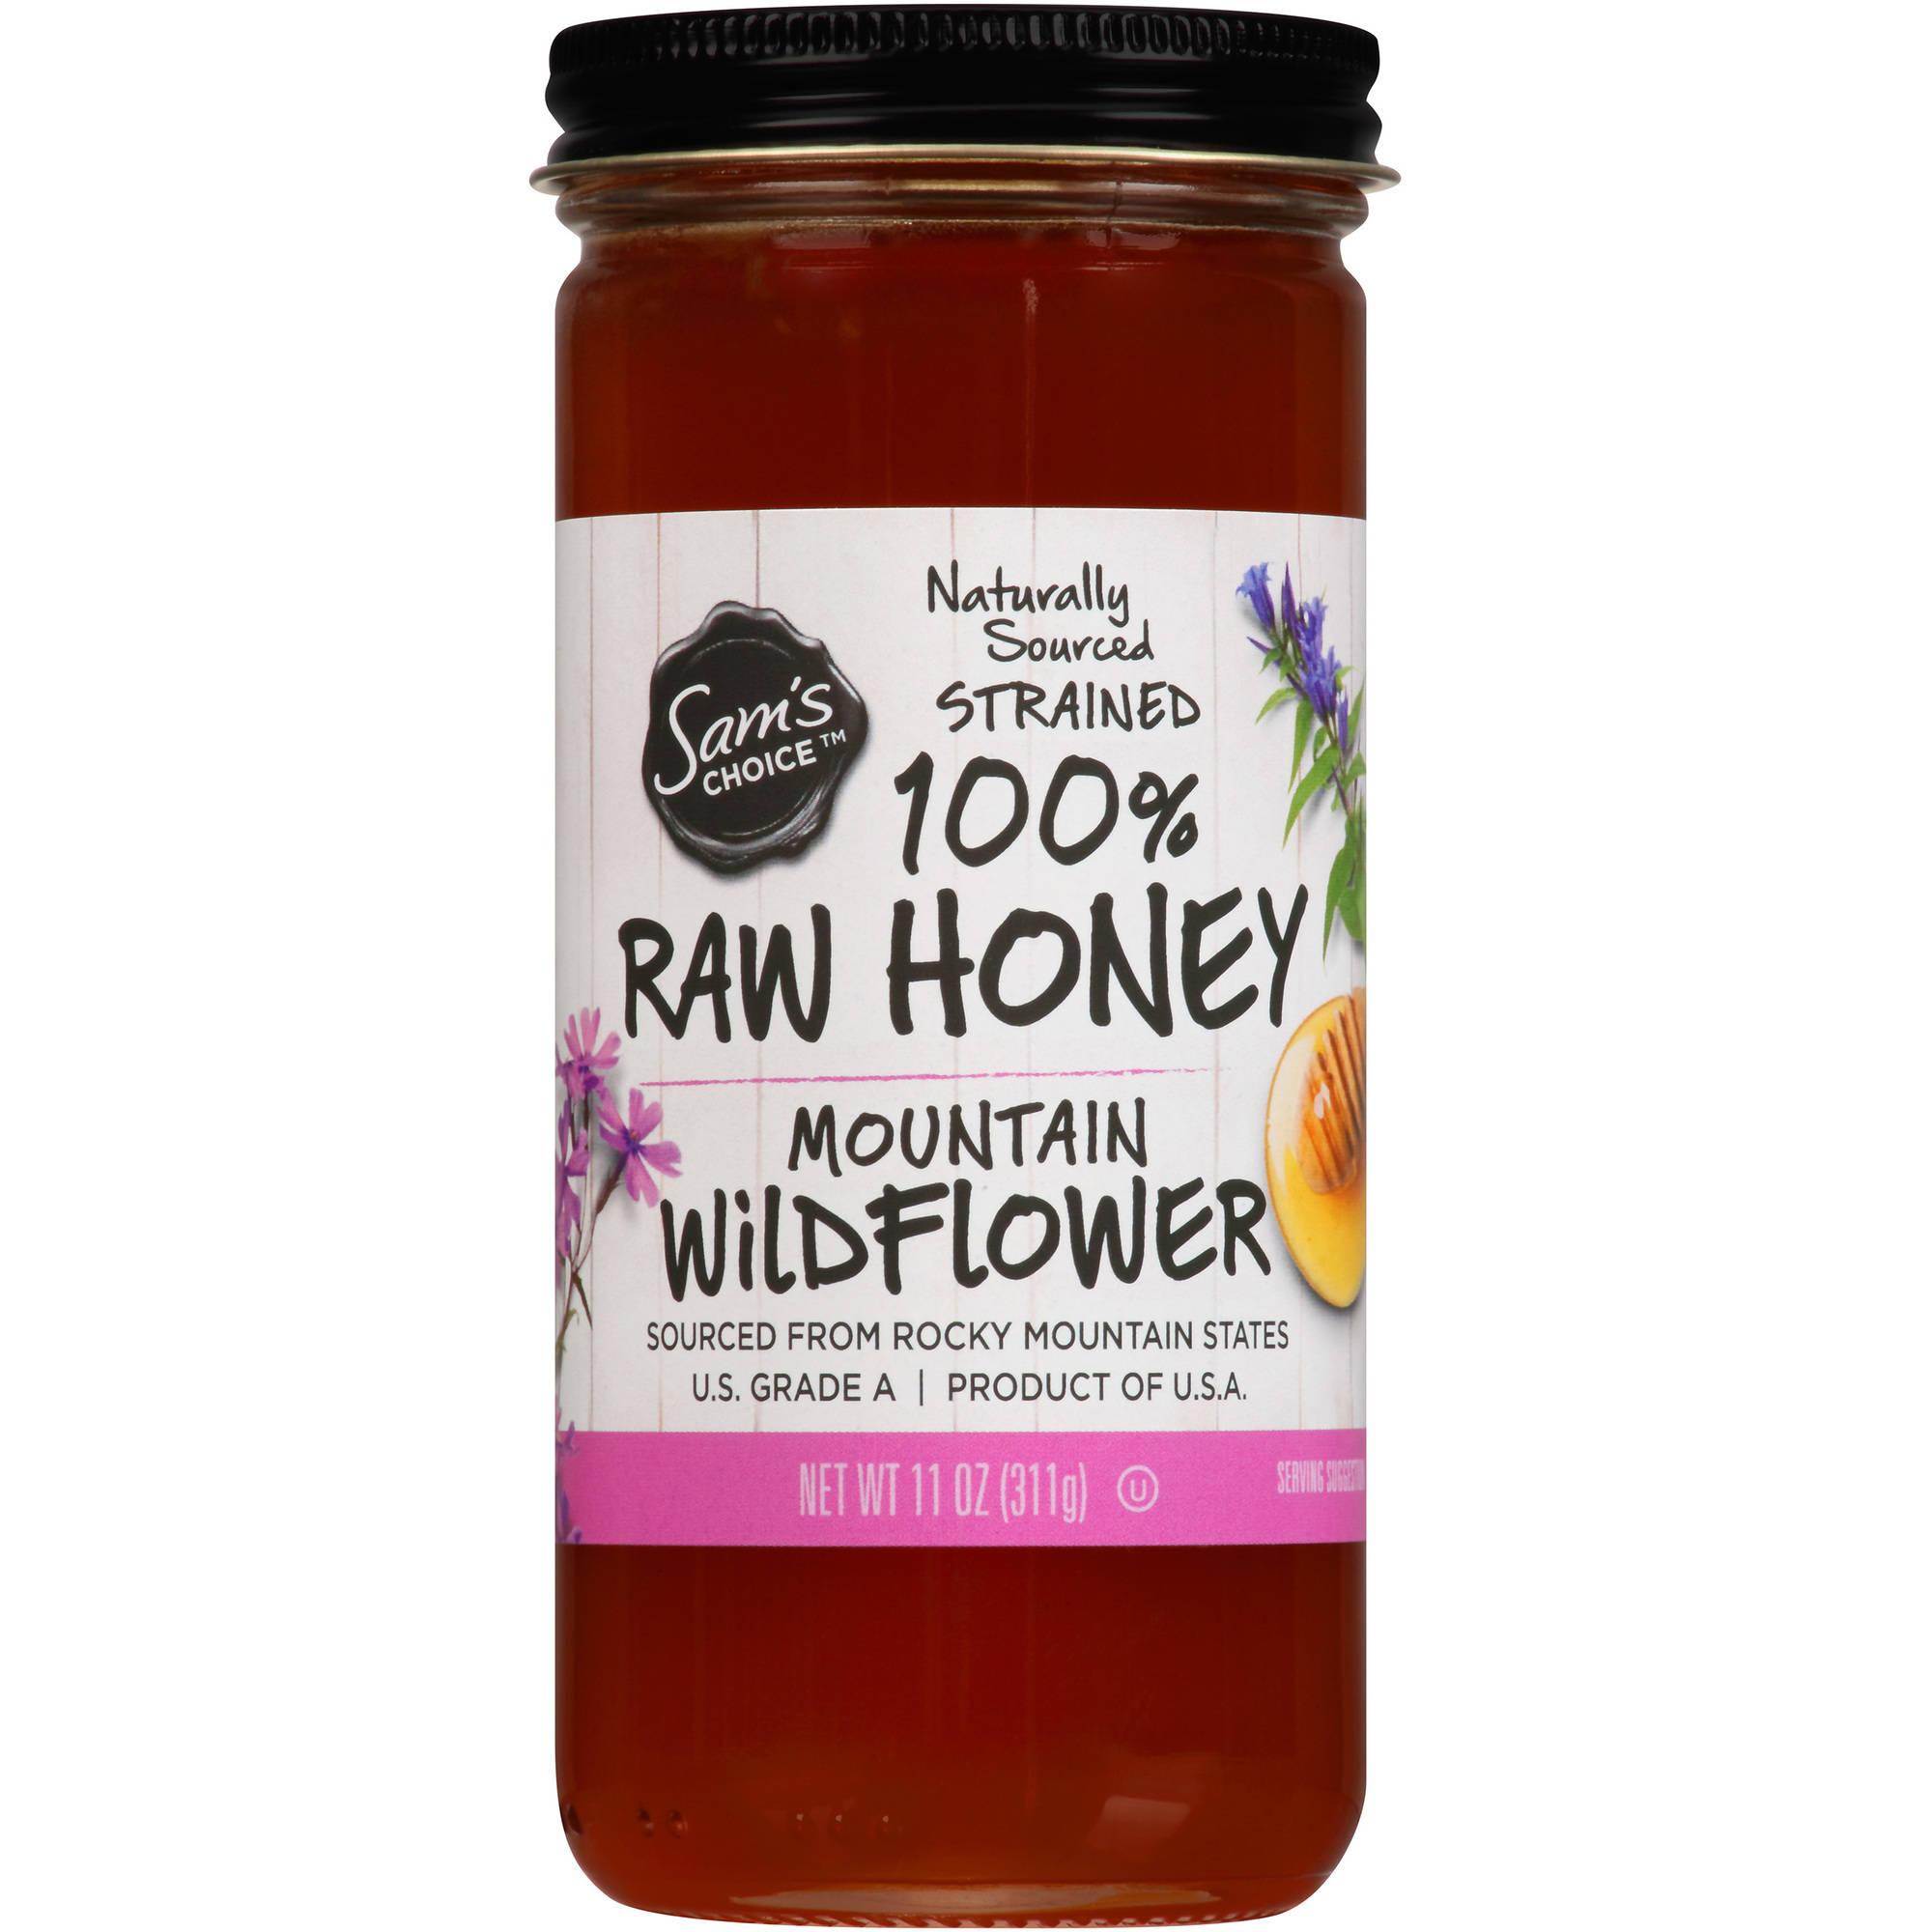 (2 Pack) Sam's Choice 100% Raw Honey, Mountain Wildflower, 11 oz